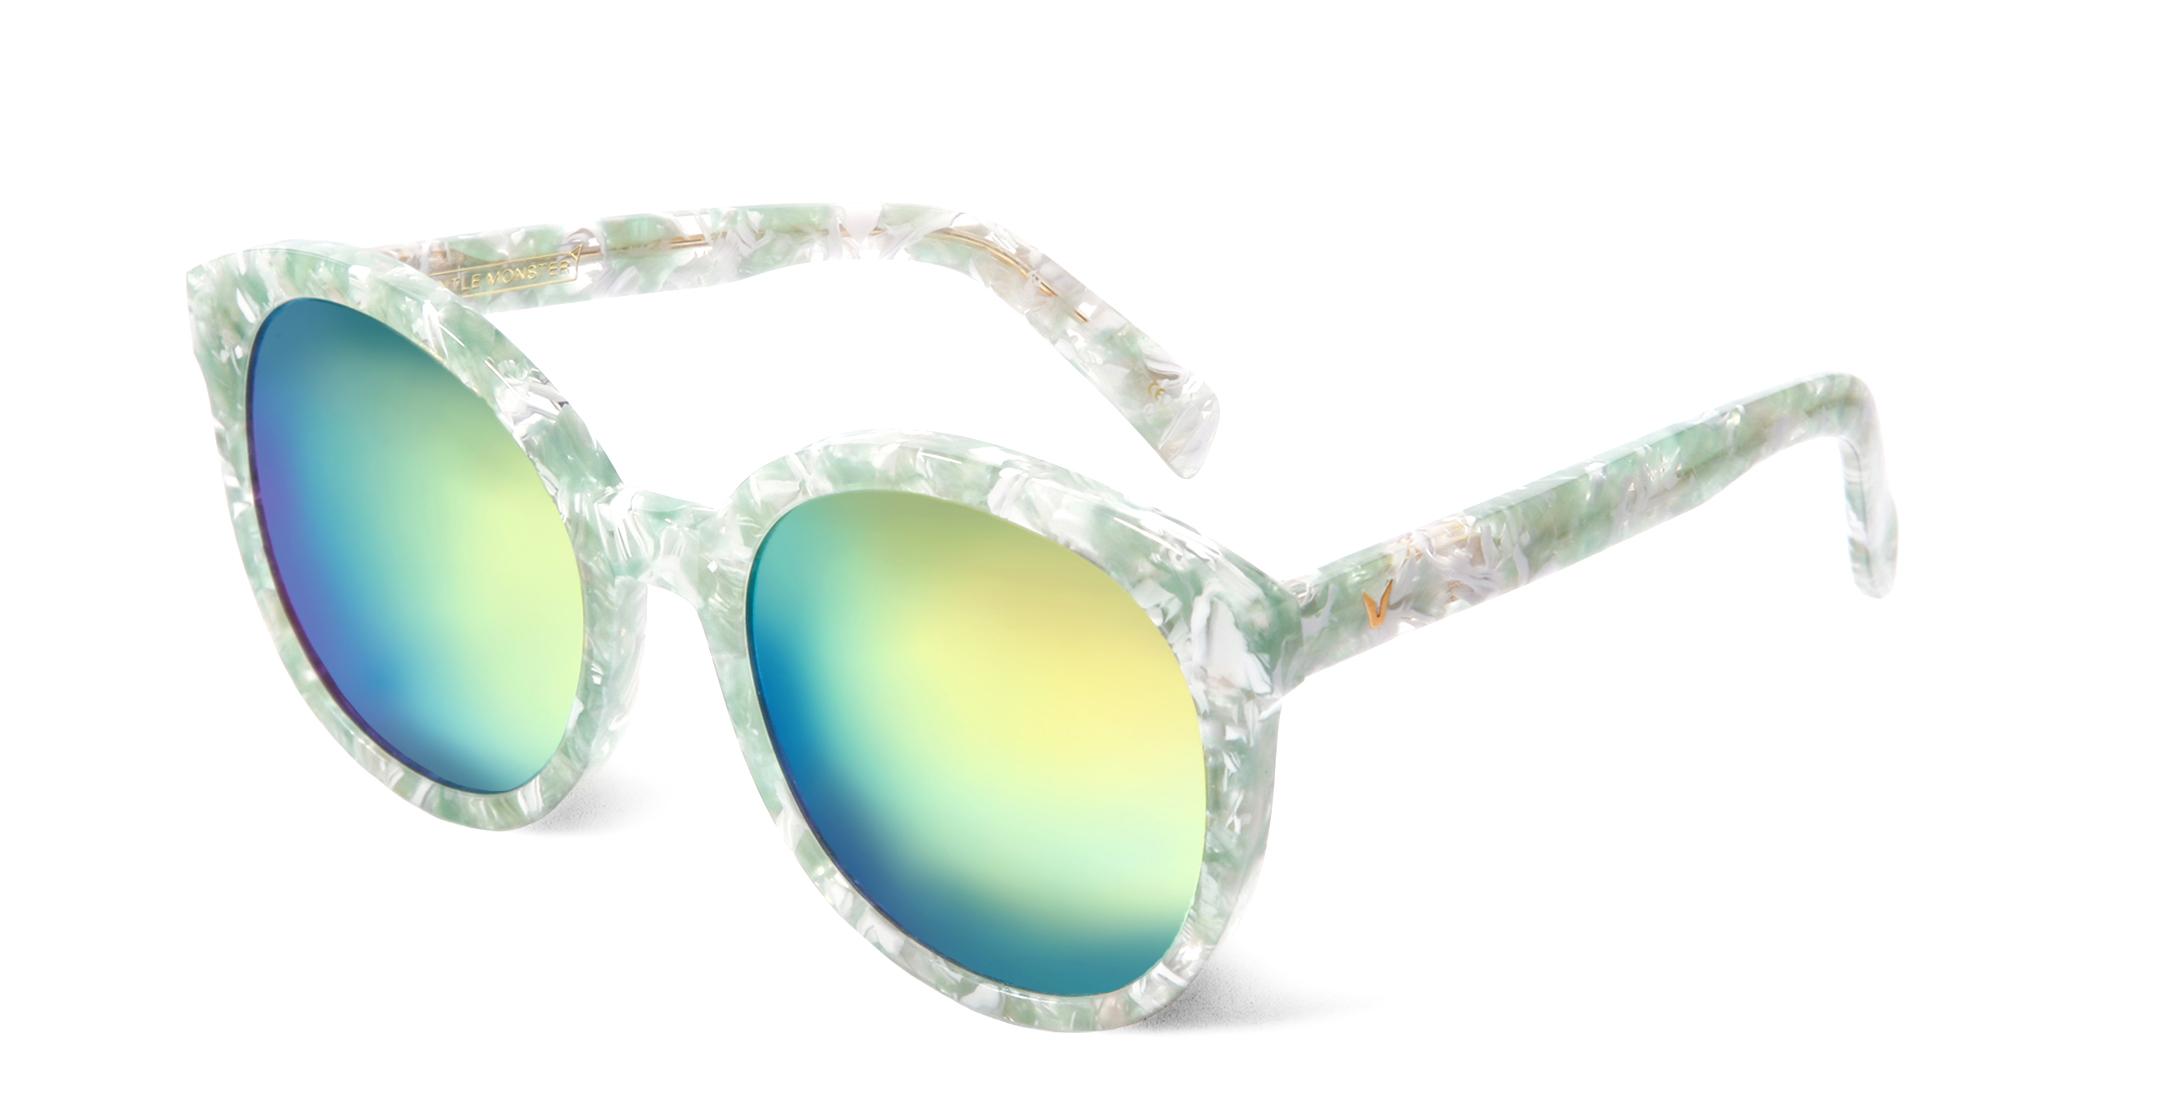 2c023a302d 首爾星星樹Kstartree GENTLE MONSTER精品太陽眼鏡 ROMAN HOLIDAY GWD 1 ...